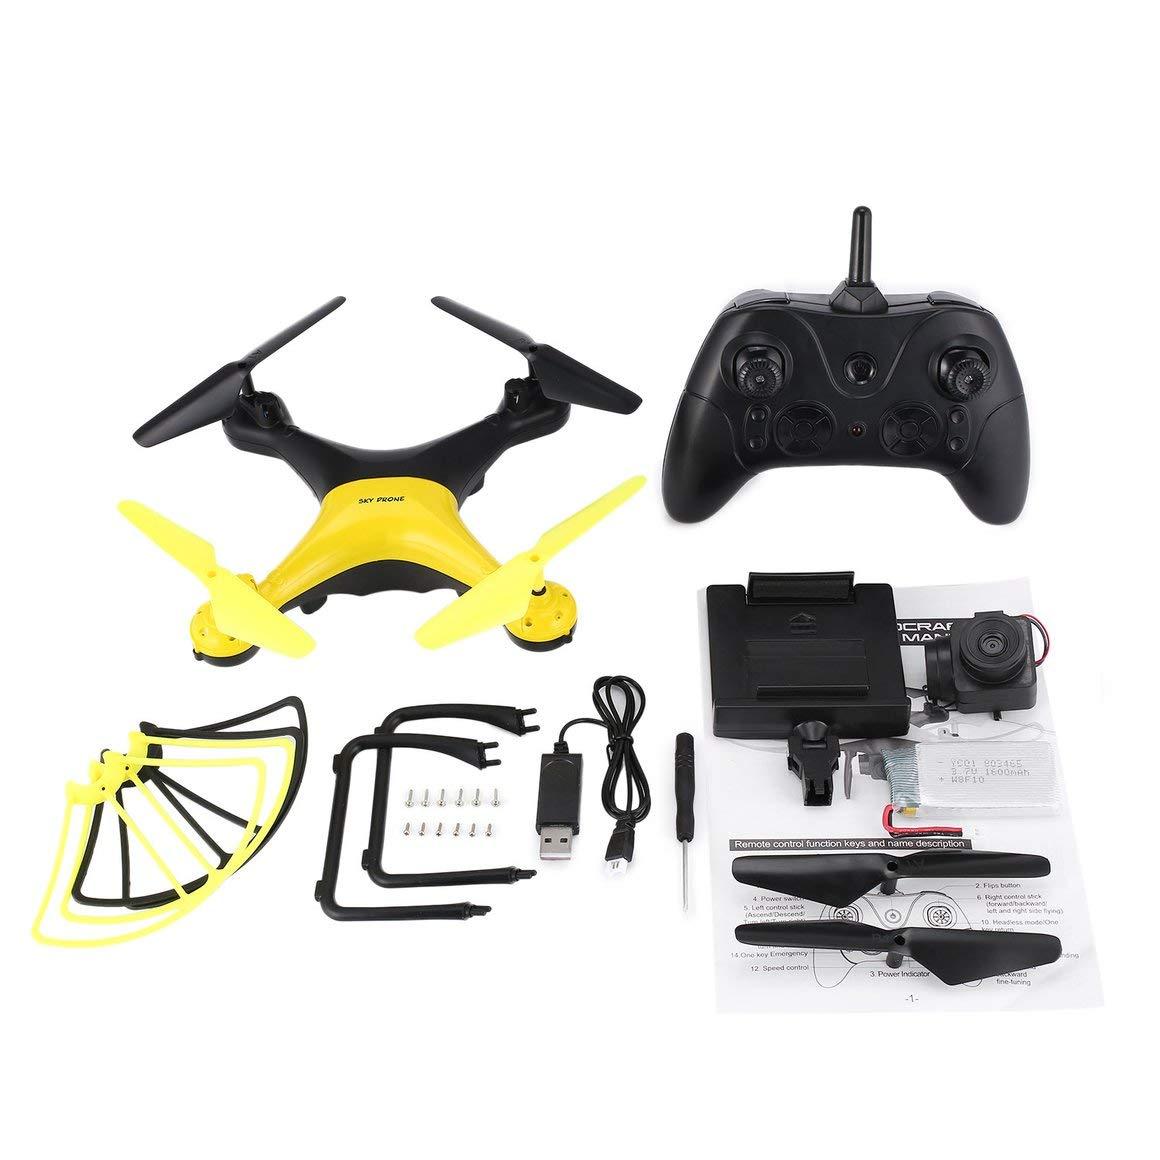 Funnyrunstore X35SH 2.4G Selfie RC Drone Quadcopter Flugzeuge mit 720P HD WiFi FPV Kamera 20 Minuten Lange Flughöhe Hold Headless 3D Flip (schwarz + gelb)